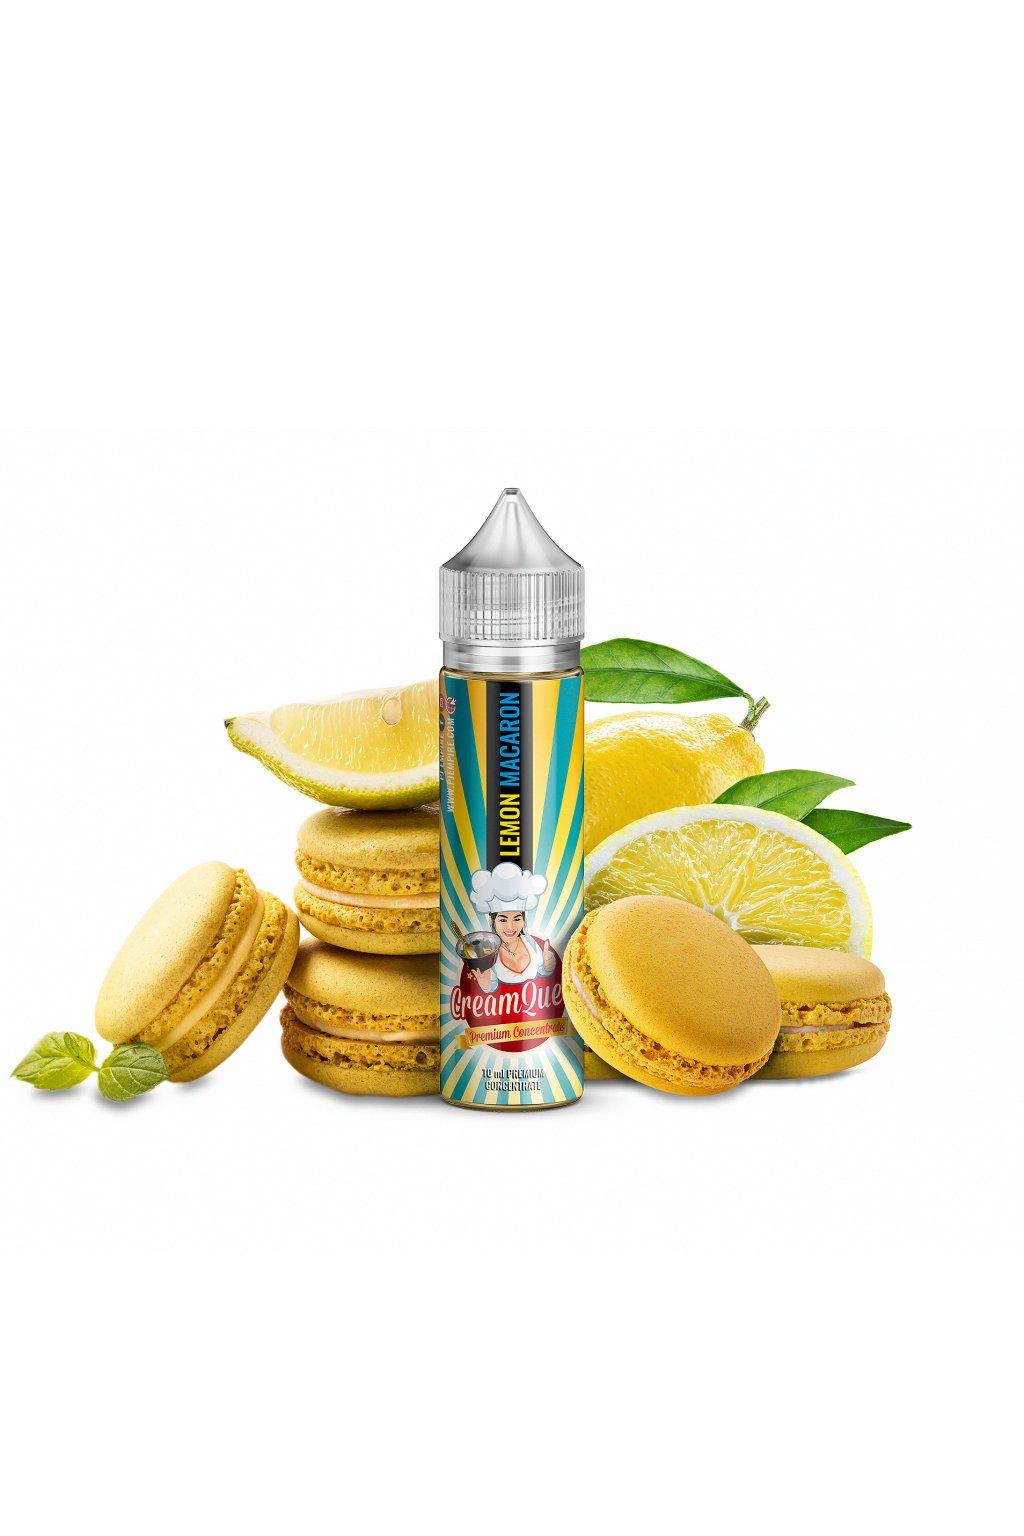 PJ Empire 10ml Cream Queen Lemon Macaron